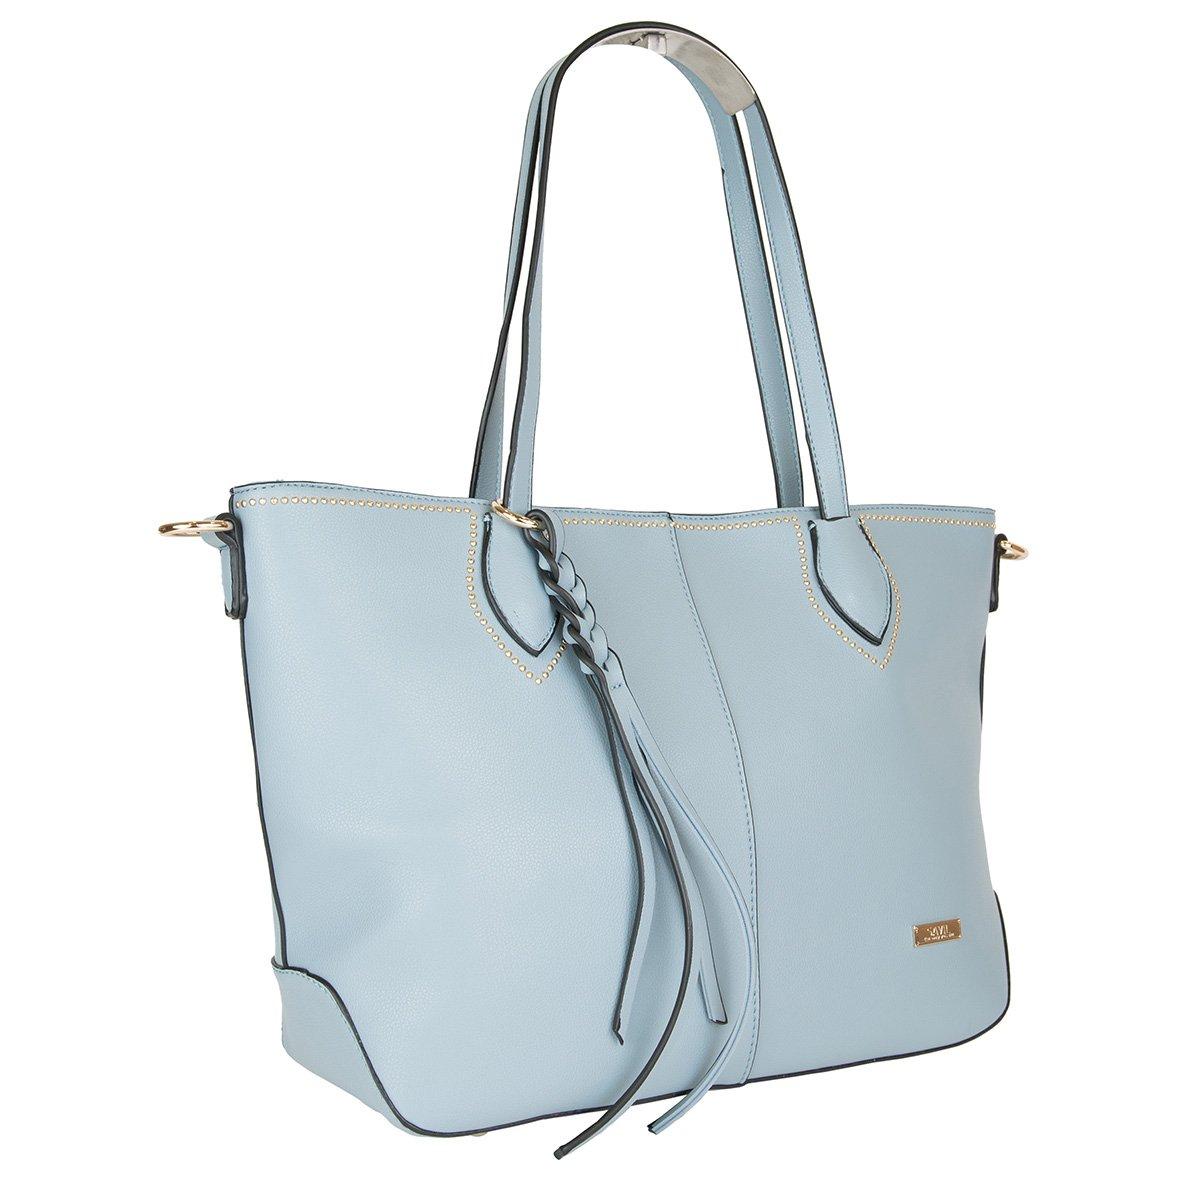 Bagsin-Savil-18-31-13-Sky_Blue-Opened-A1